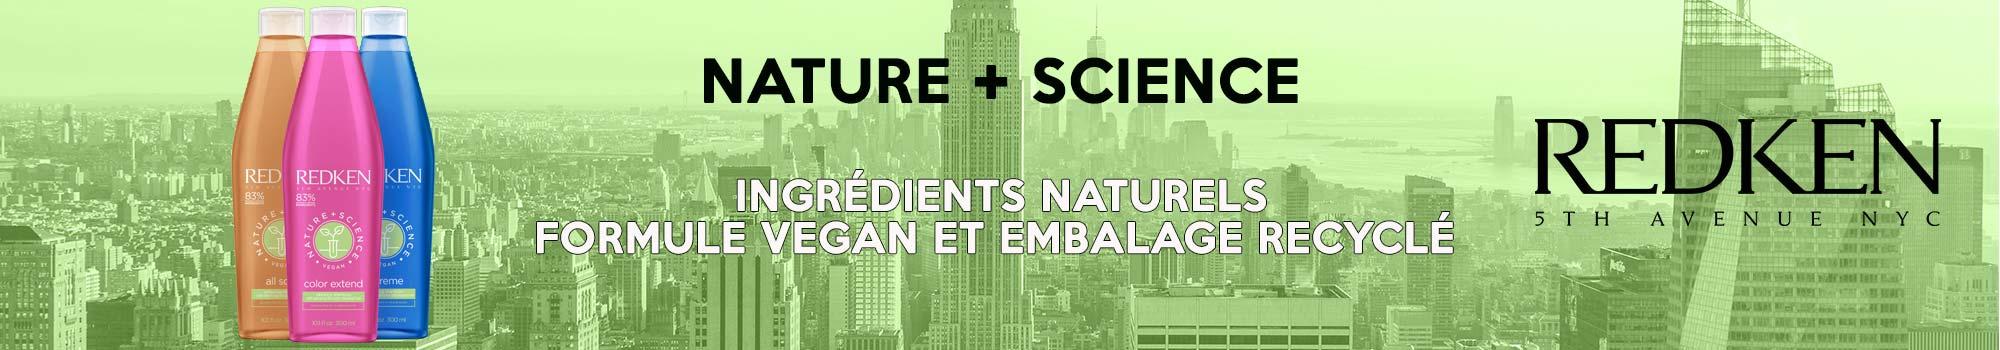 Redken Nature + Science